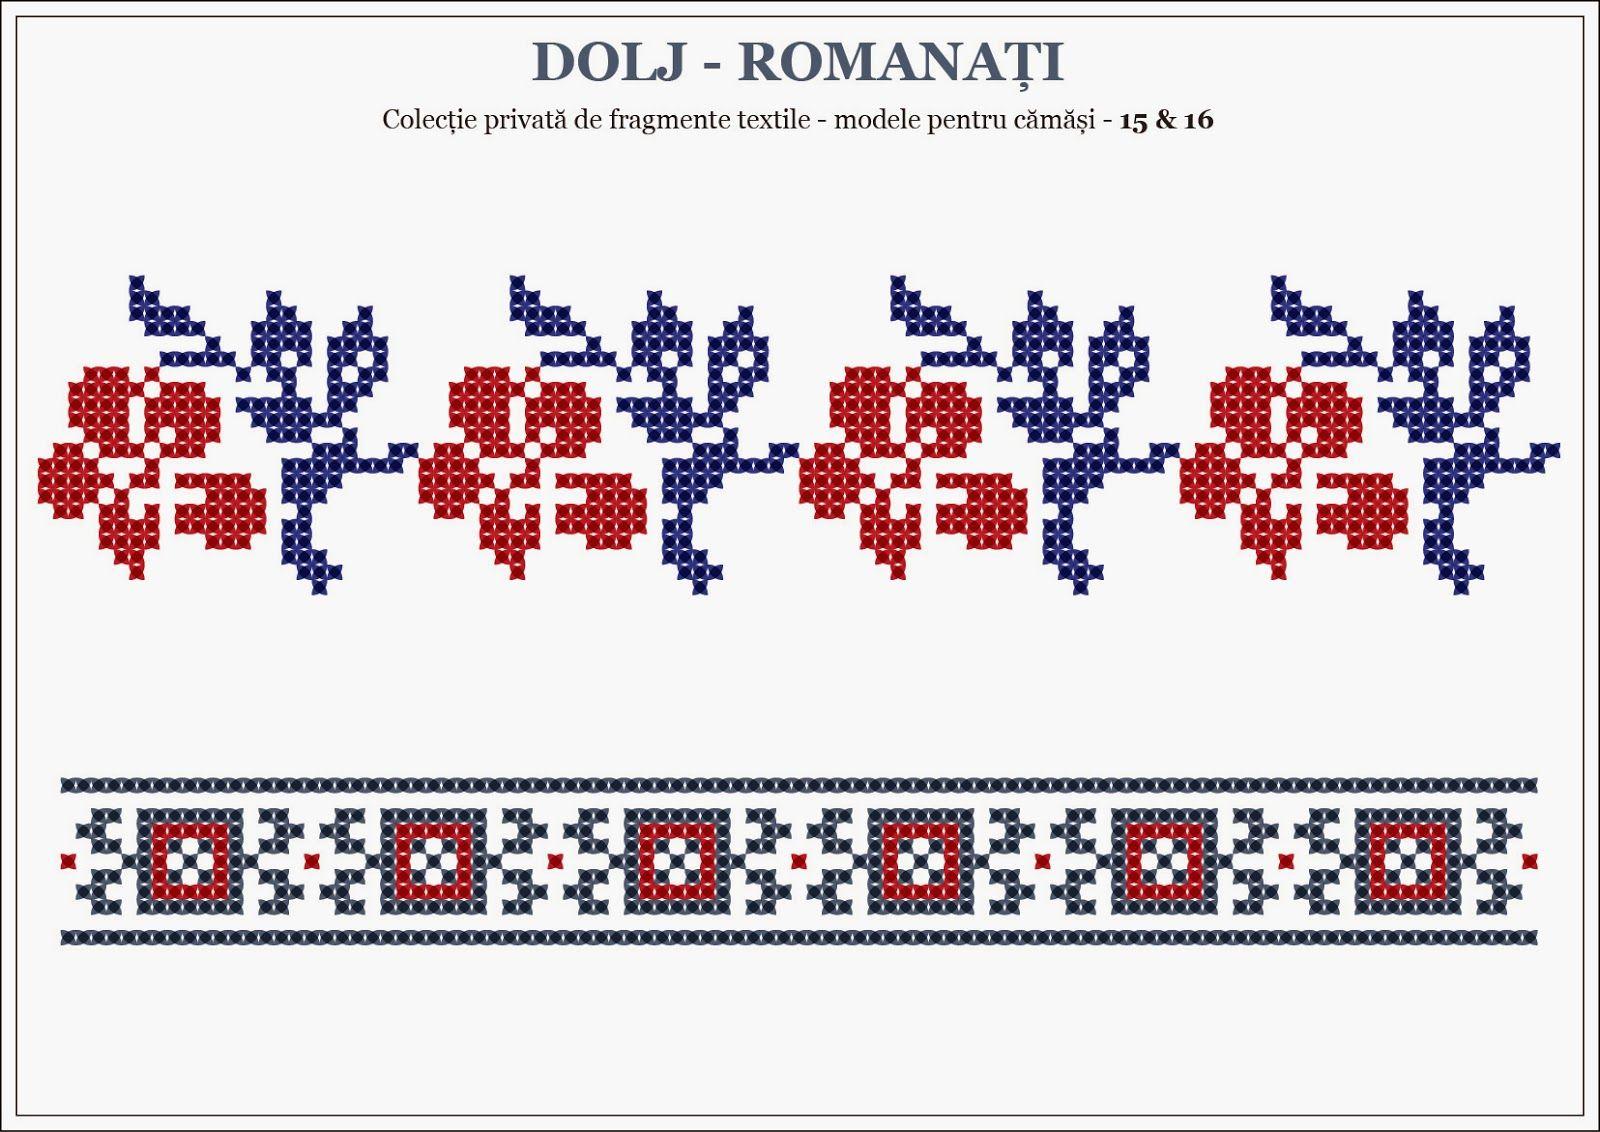 Semne Cusute: romanian traditional motifs - OLTENIA - Dolj & Rom ...